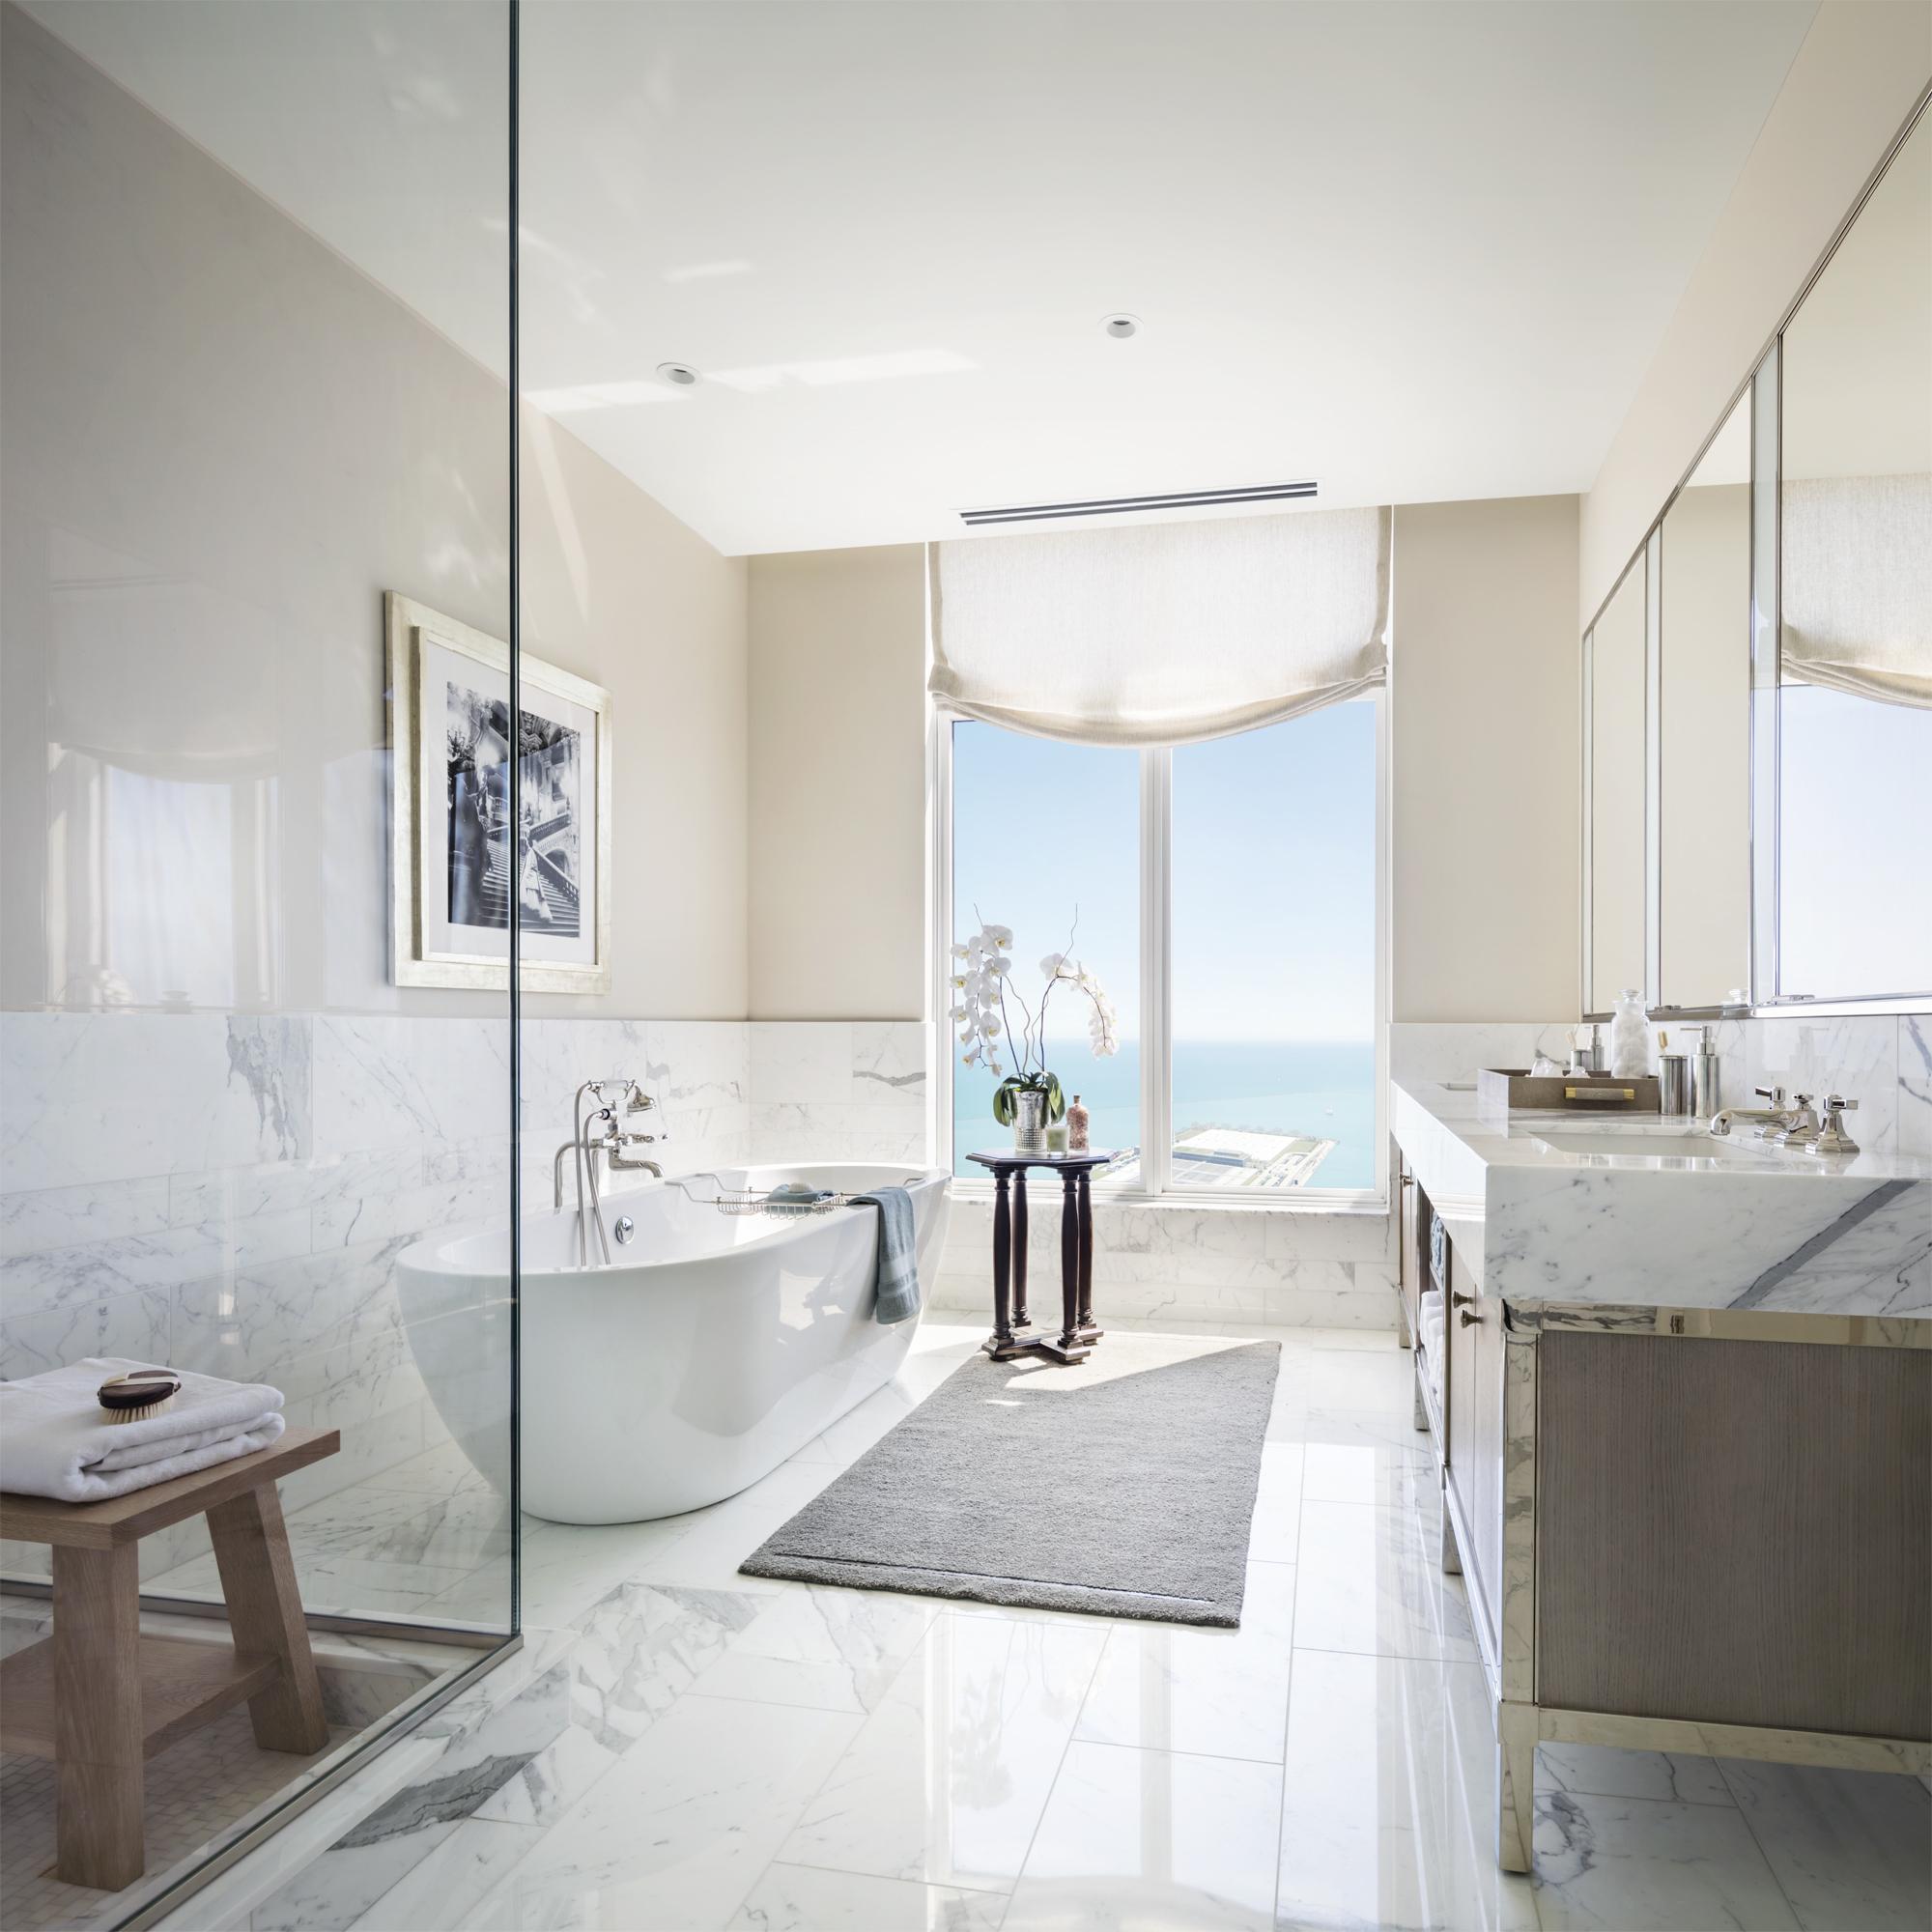 8_One-Bennett-Park-Condominium-5106-Master-Bathroom.jpg